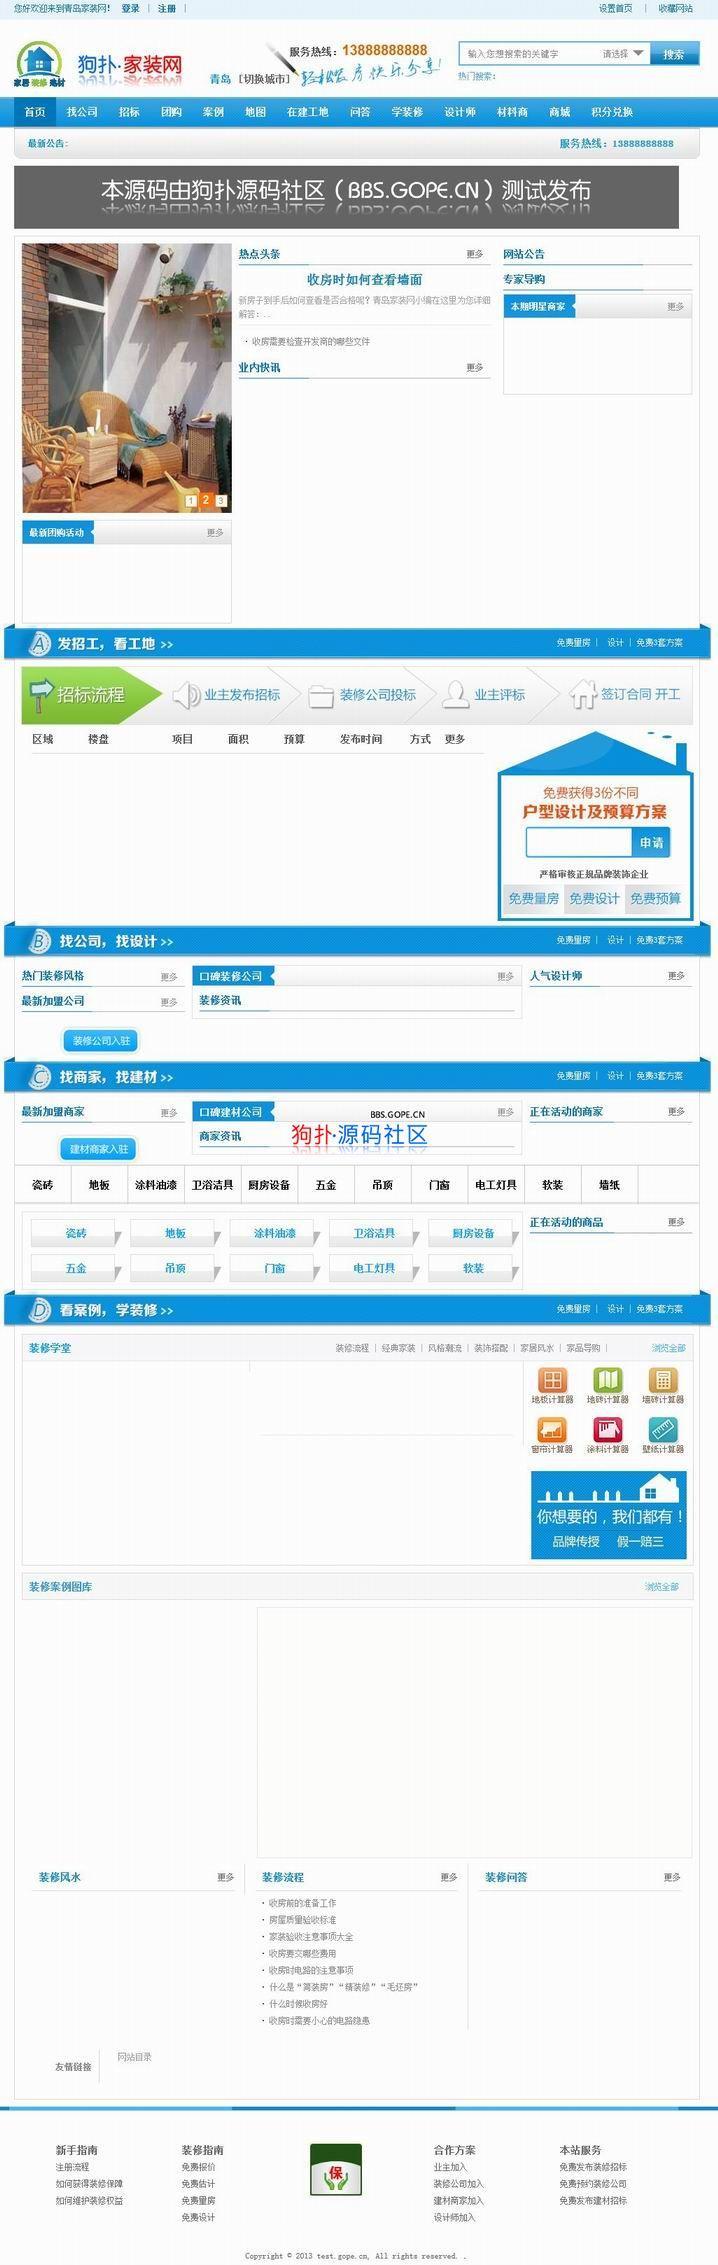 【PHP】家居装饰装修门户系统V3.7最新破解版[PHP+MYSQL]